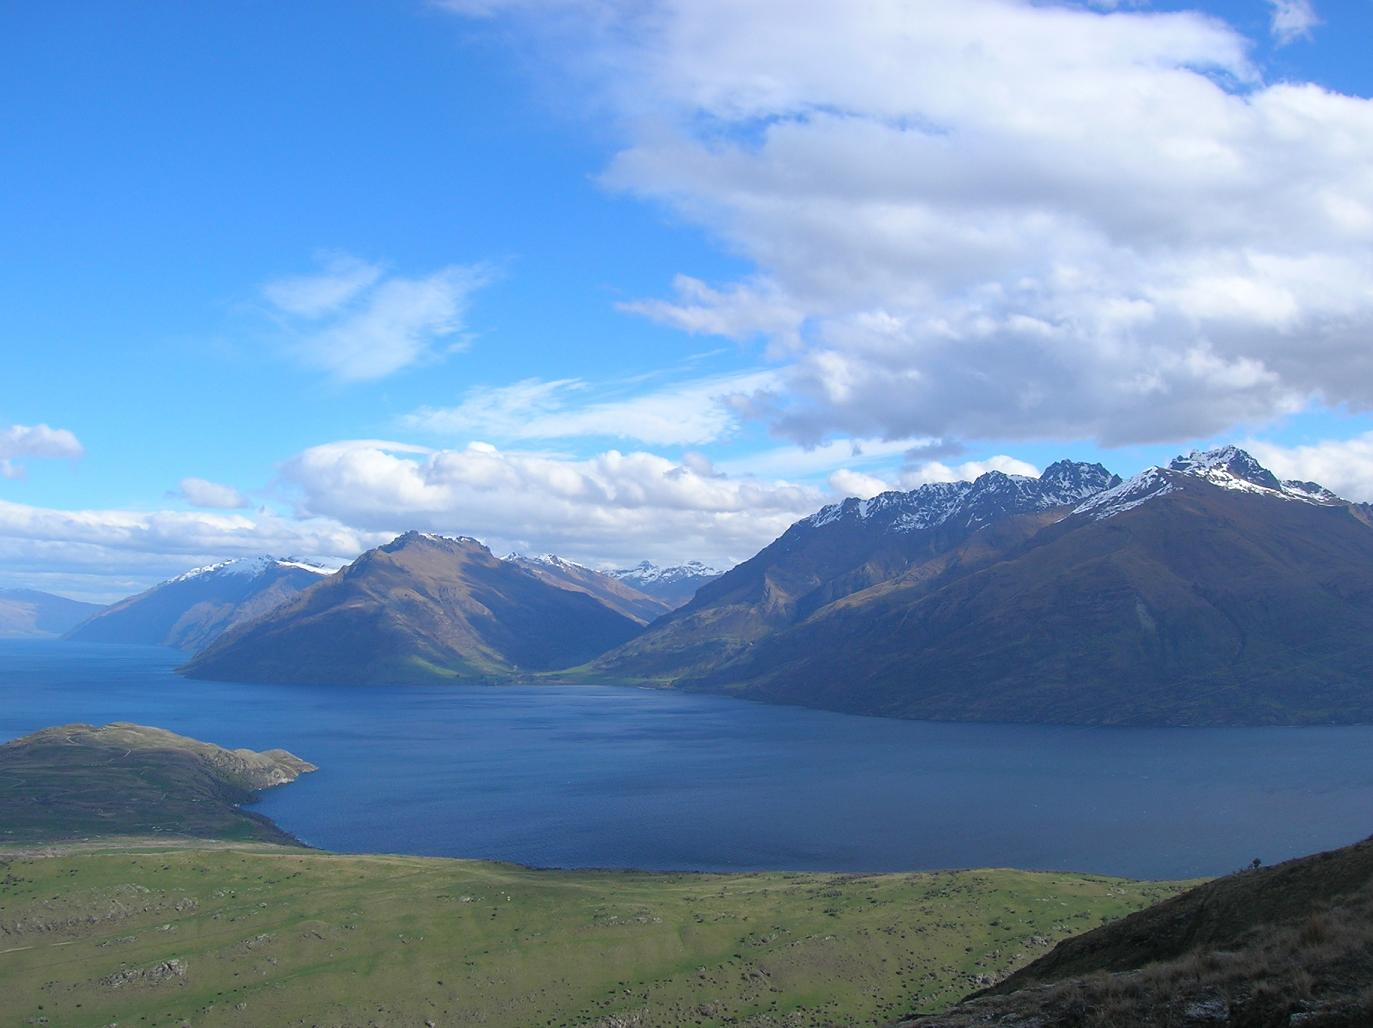 Lake Wakitipu 2